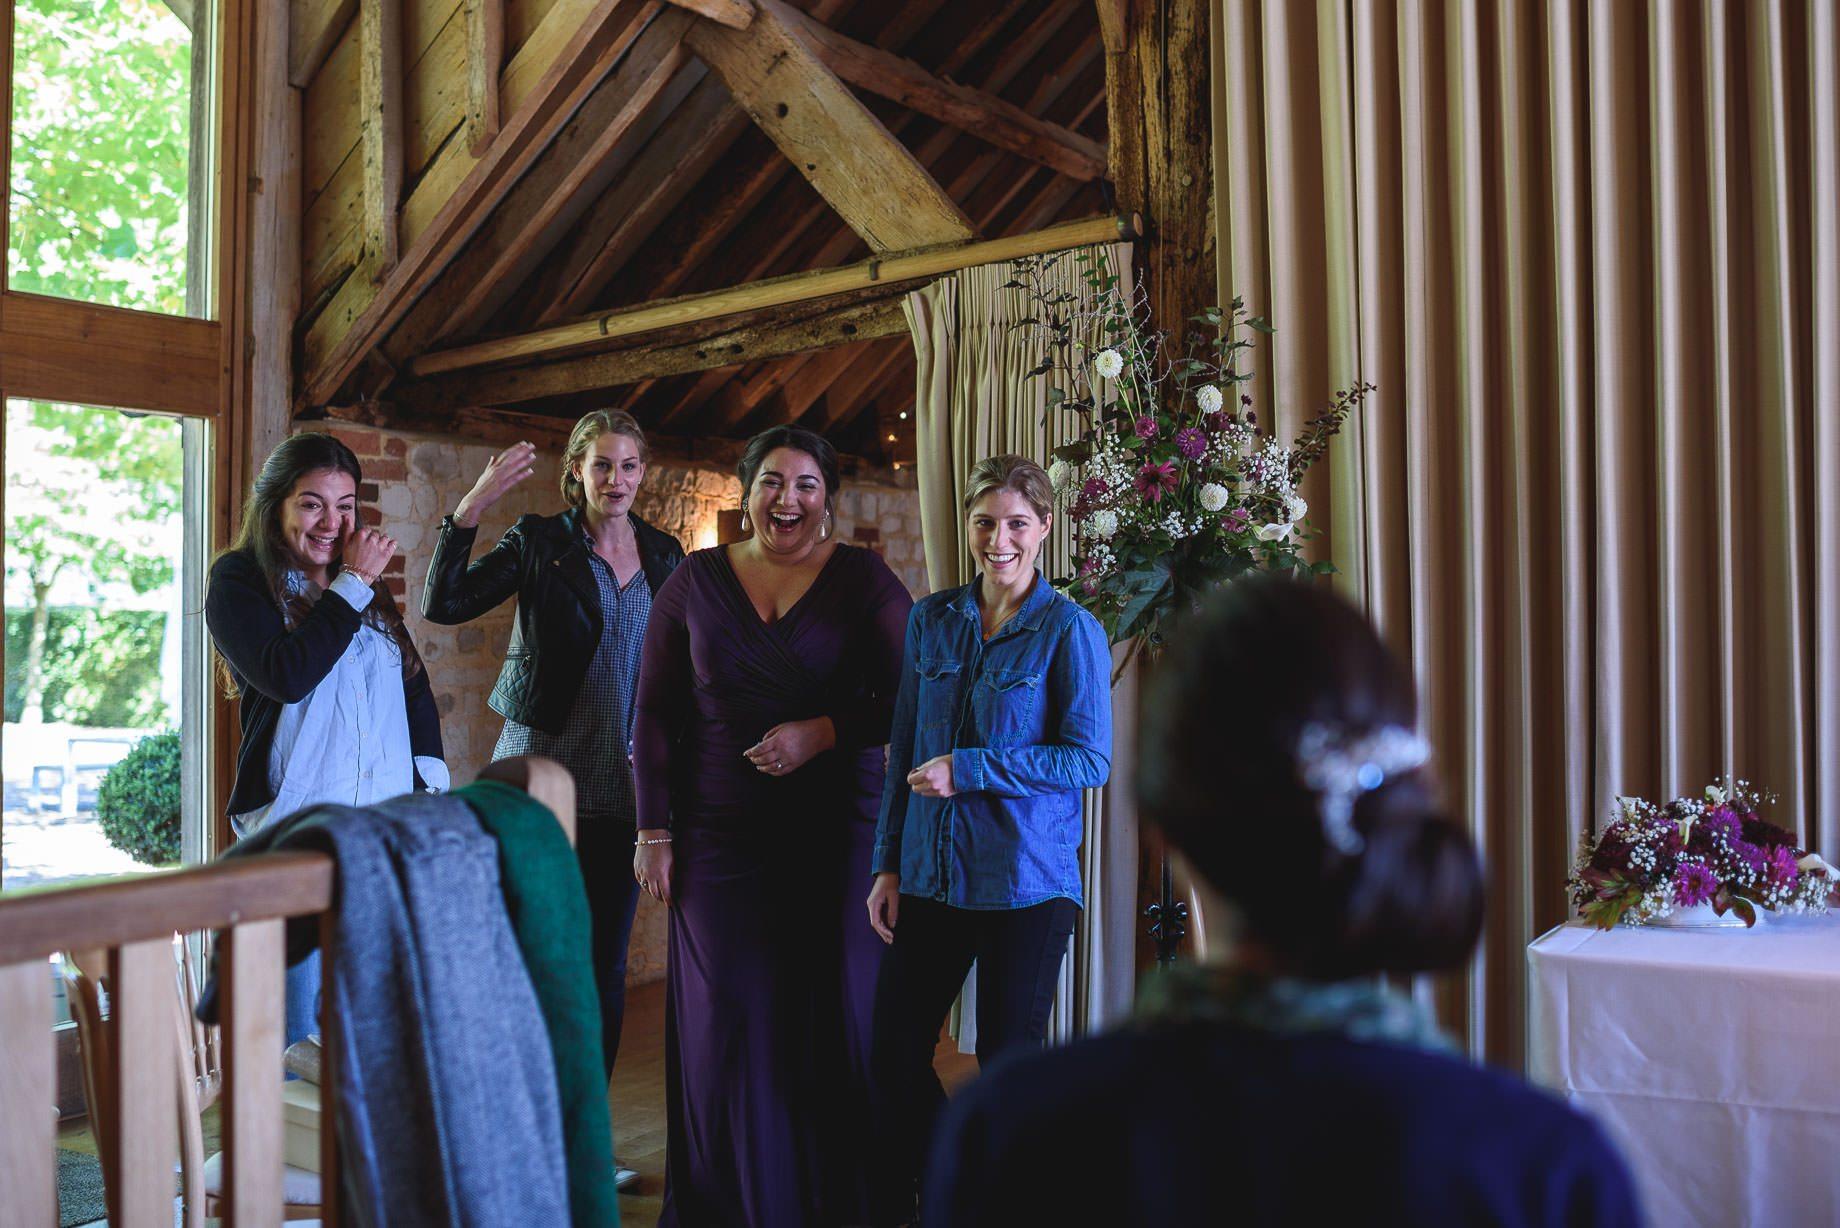 bury-court-barn-wedding-photography-guy-collier-photography-nadia-tom-8-of-184